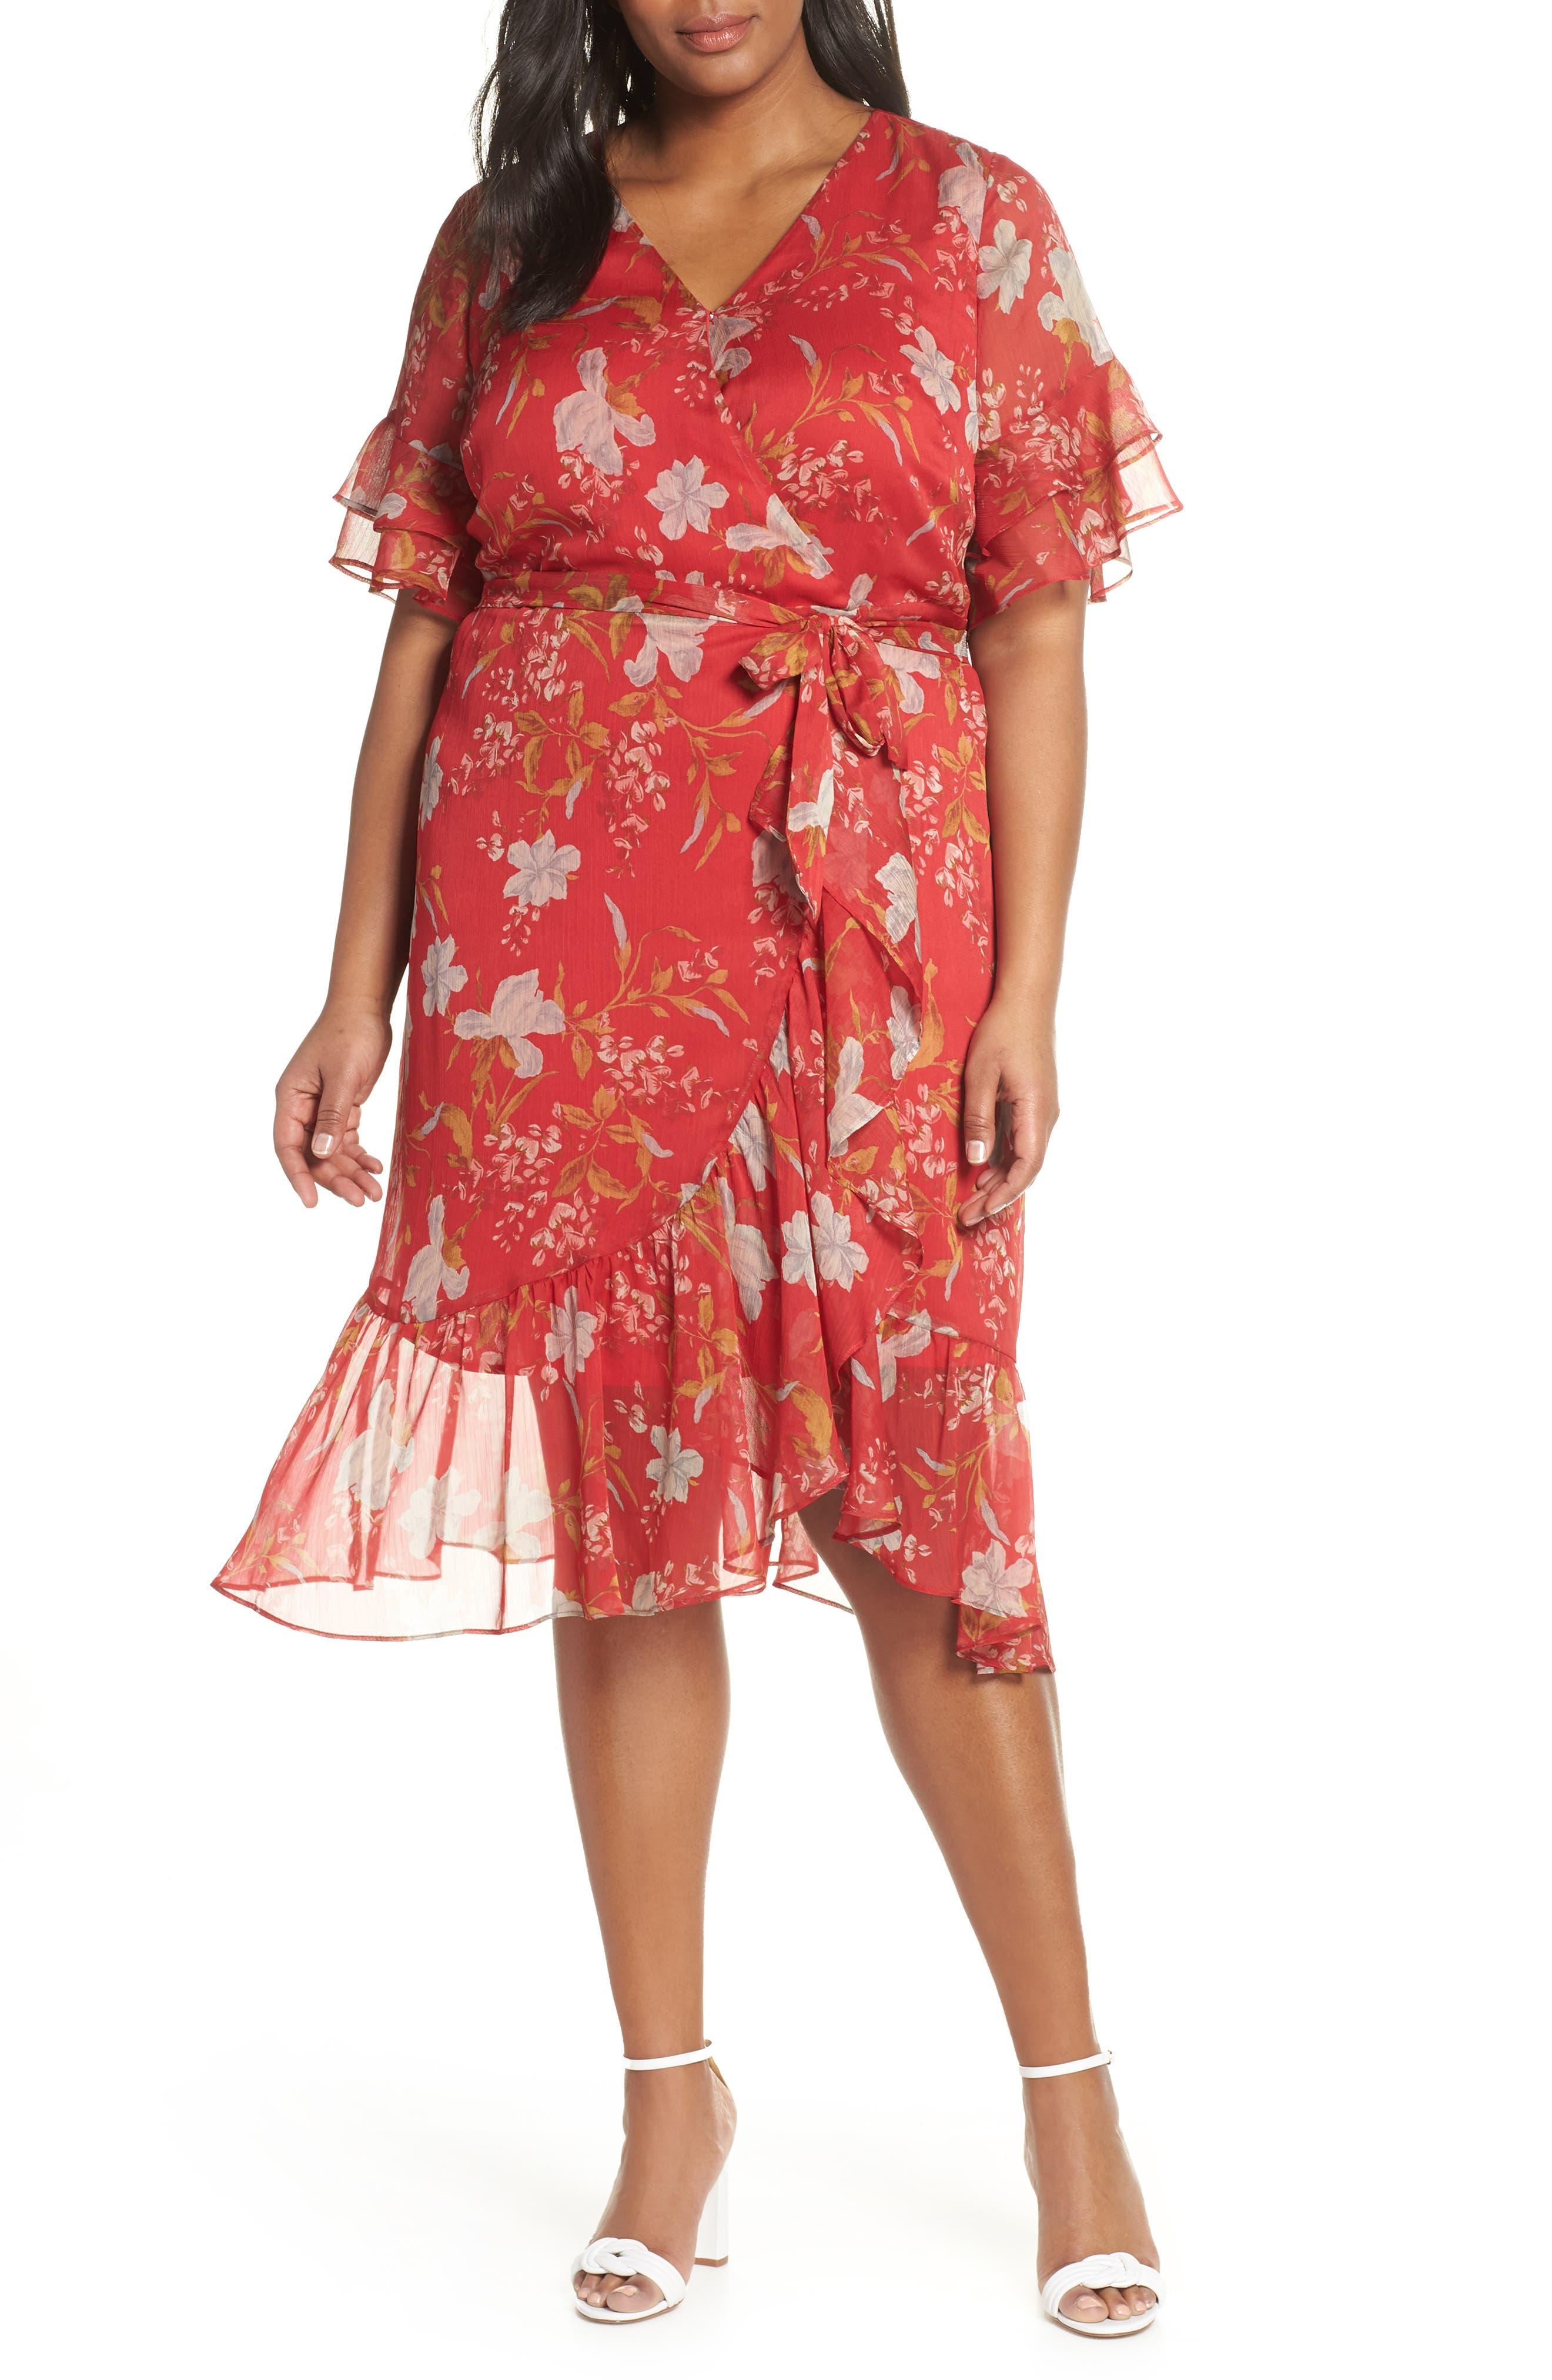 1930s Art Deco Plus Size Dresses   Tea Dresses, Party Dresses Plus Size Womens Vince Camuto Wildflower Tiered Ruffle Chiffon Dress Size 24W - Red $179.00 AT vintagedancer.com